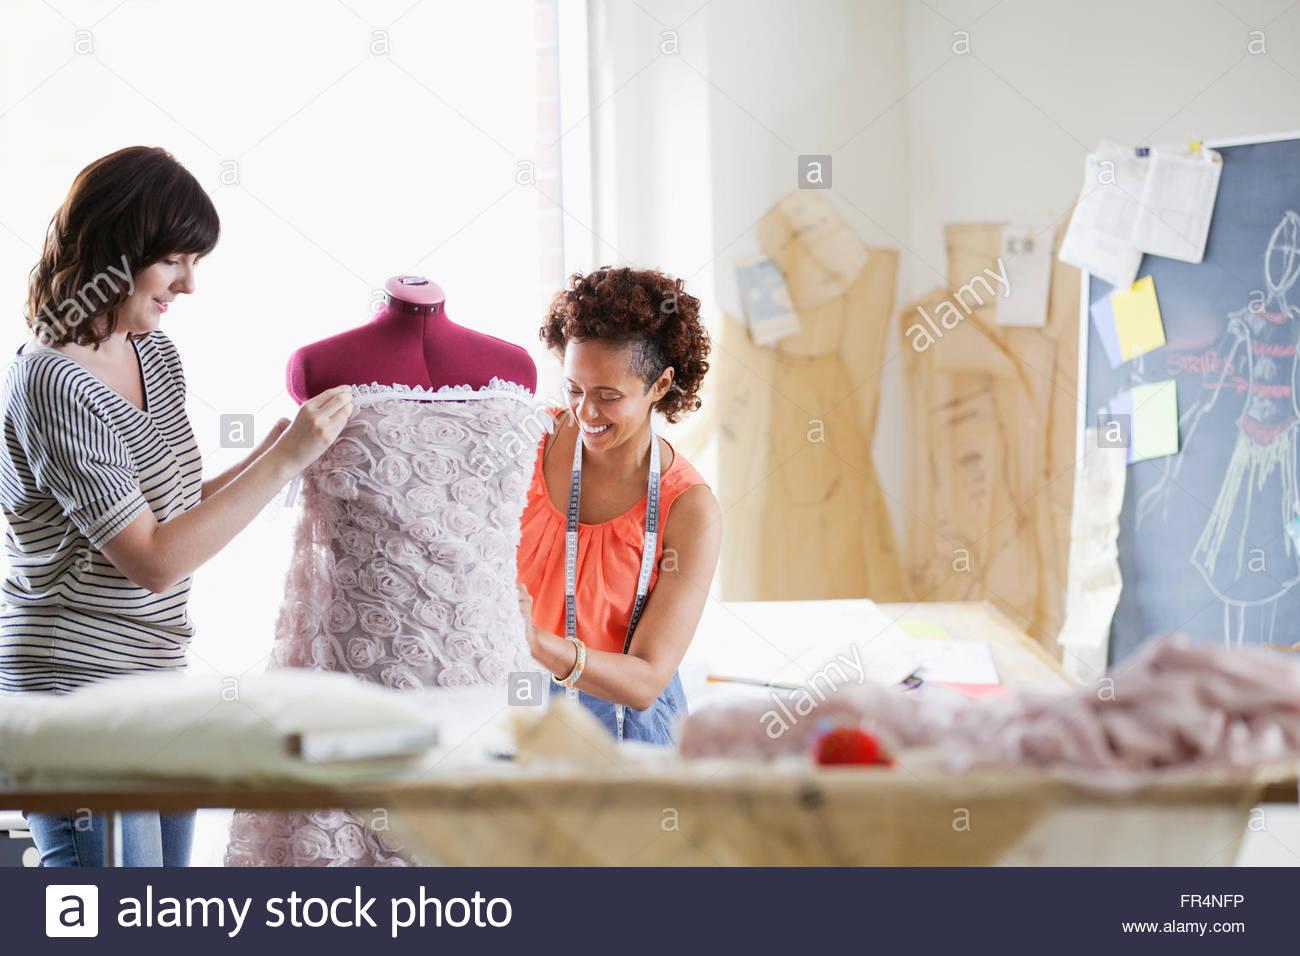 Les concepteurs de robe robe de travailler ensemble à former Photo Stock